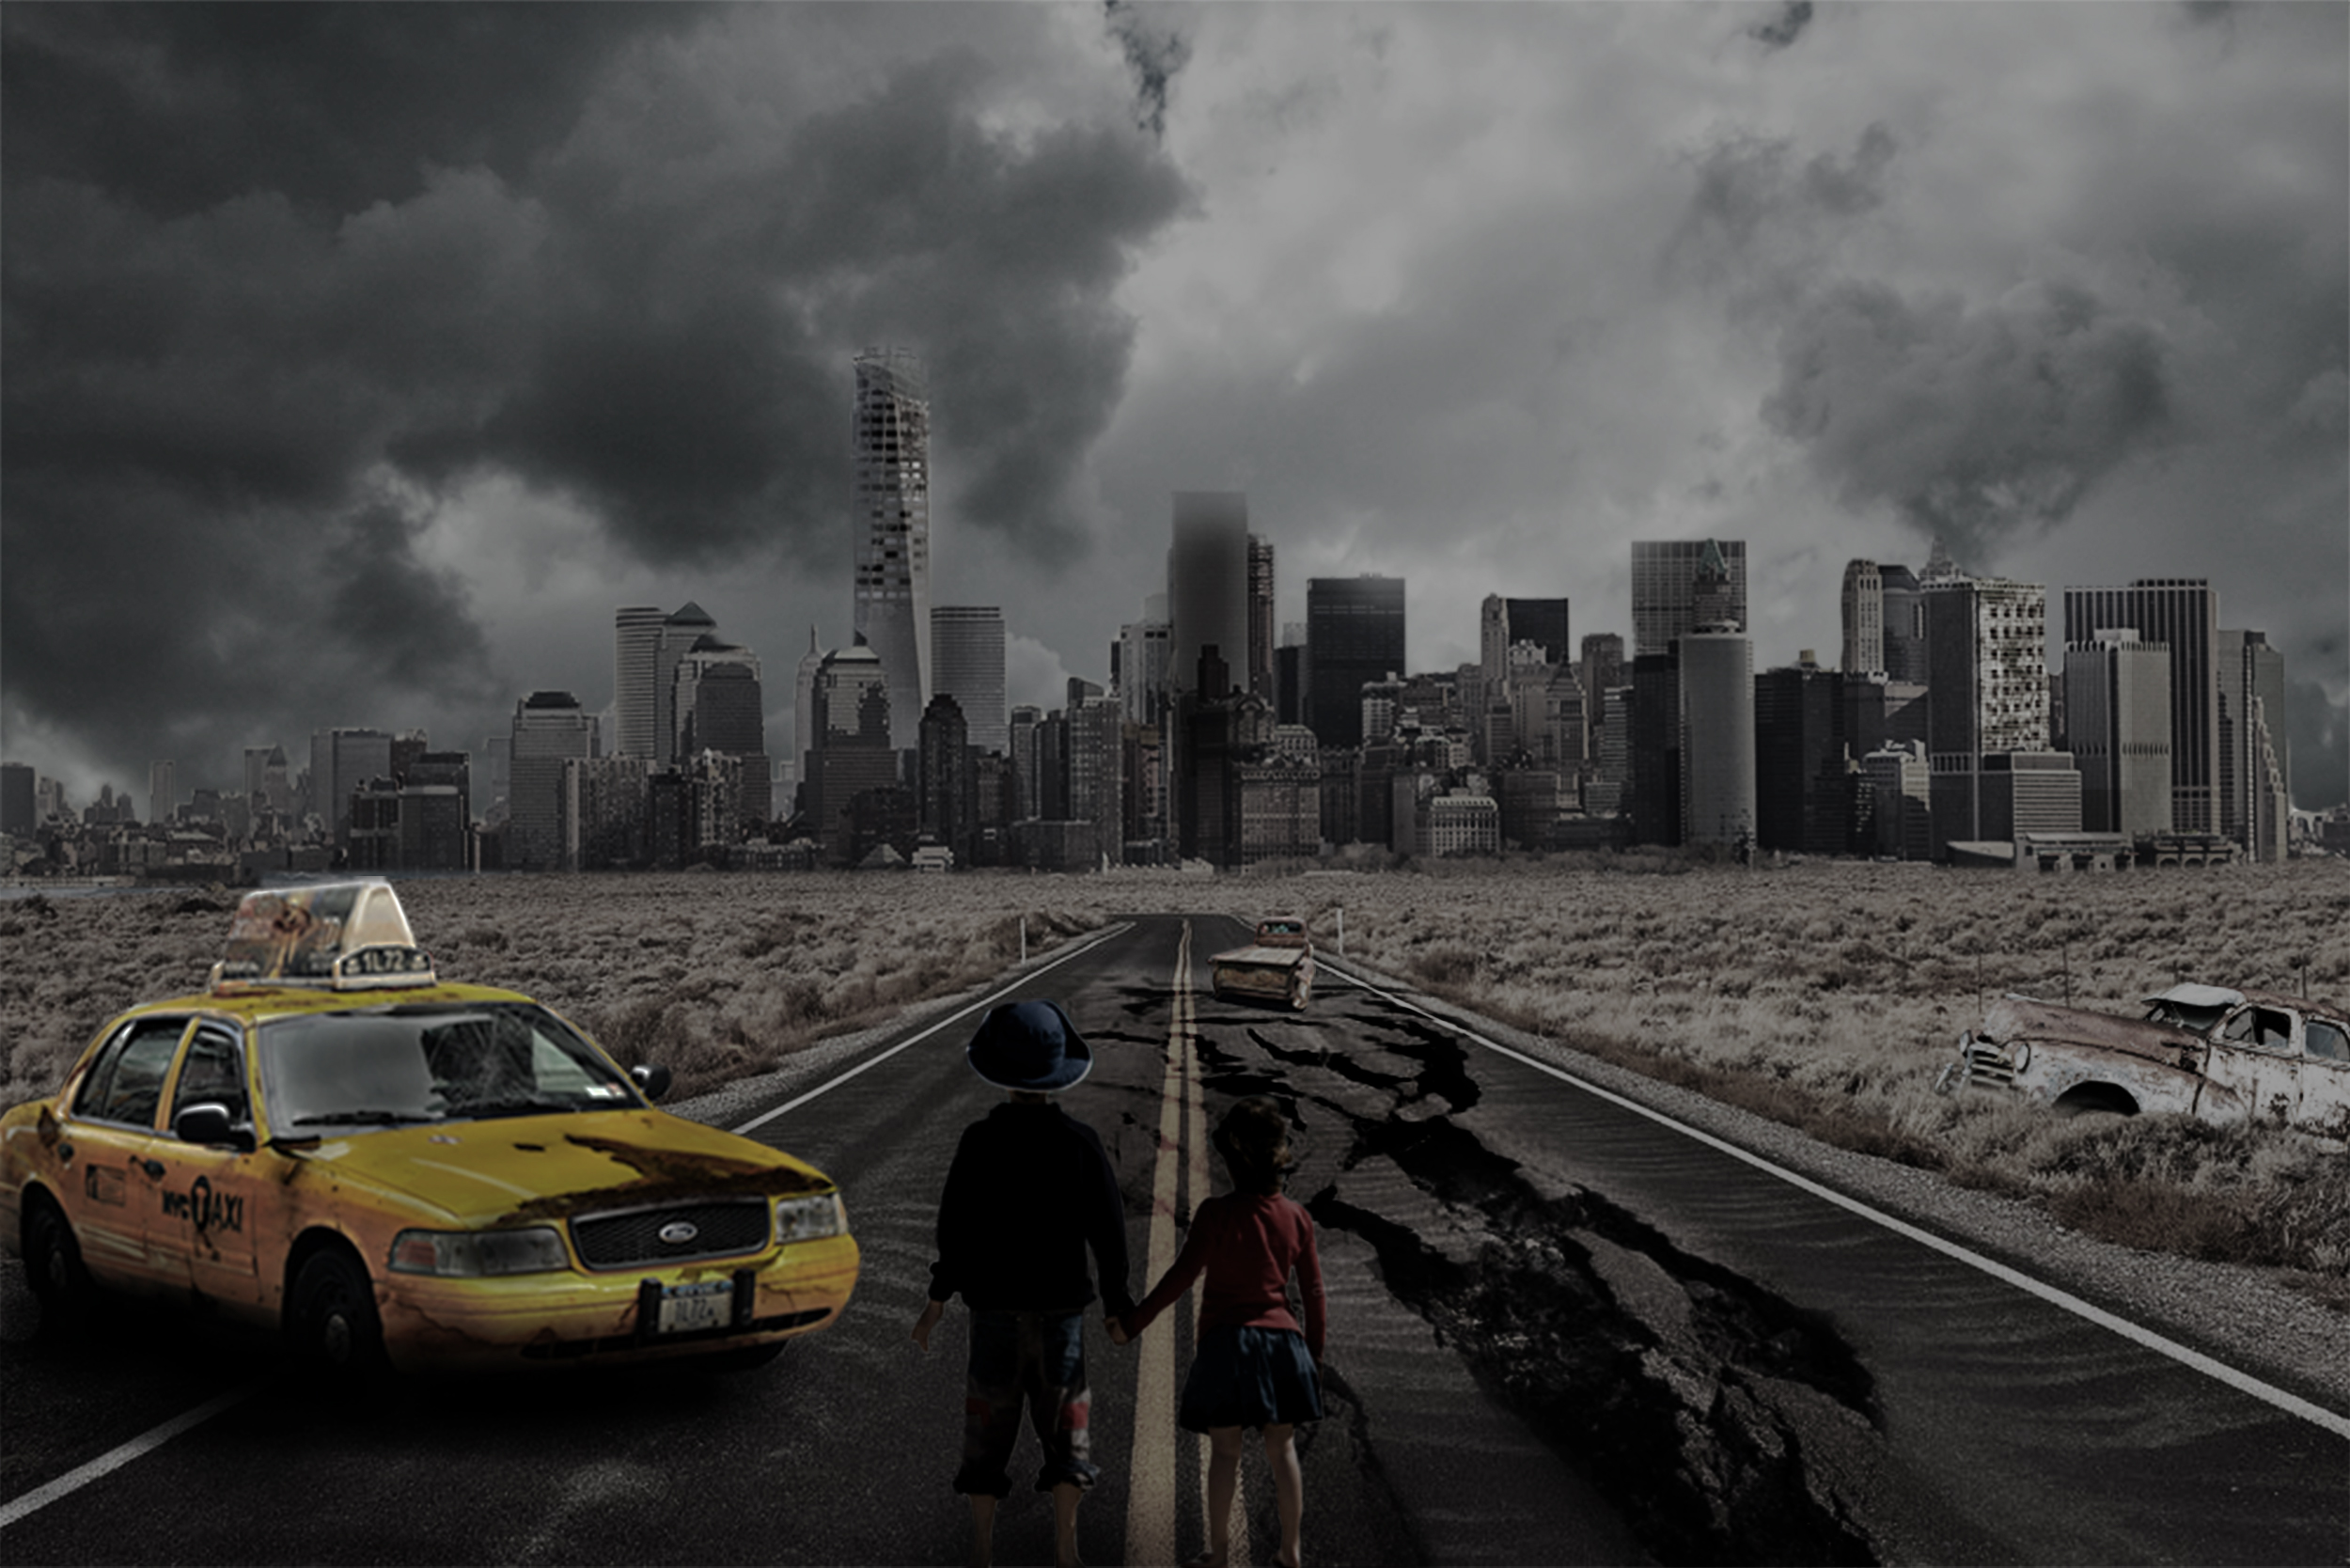 Apocalyptic image. Children on abandoned road.